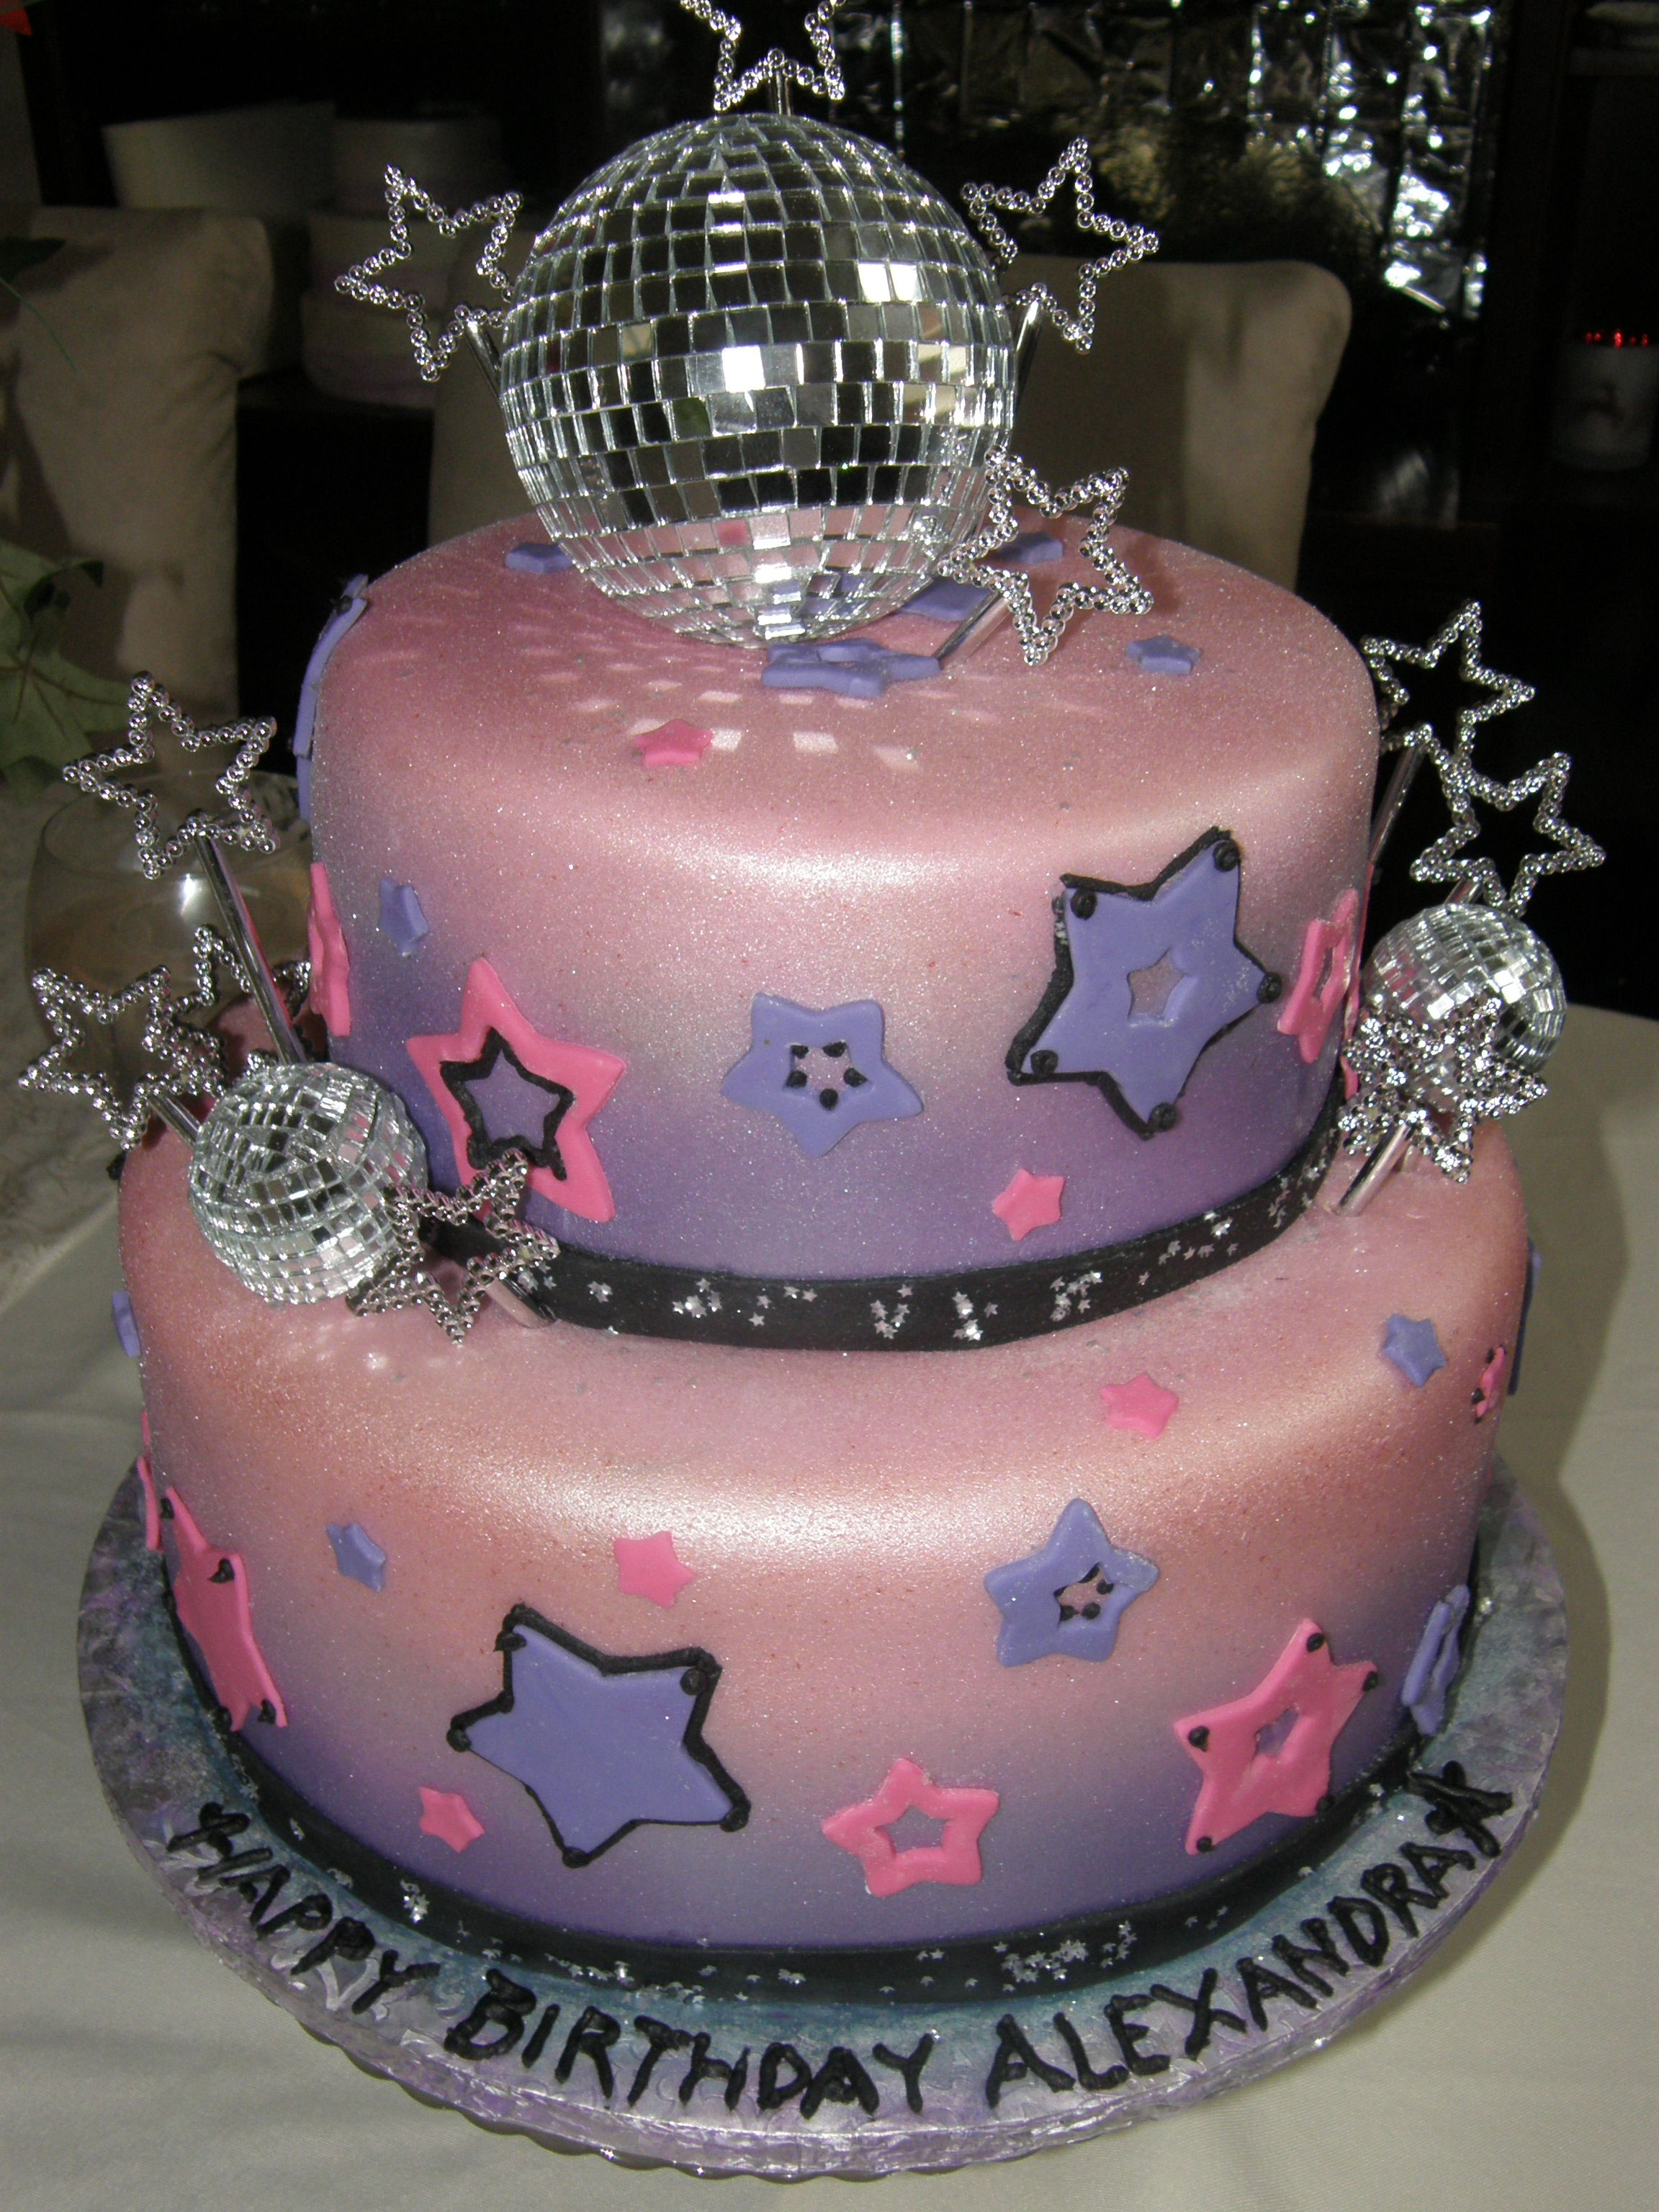 Disco Ball Cake Sweet Cakes Custom Cakery Pinterest Cake